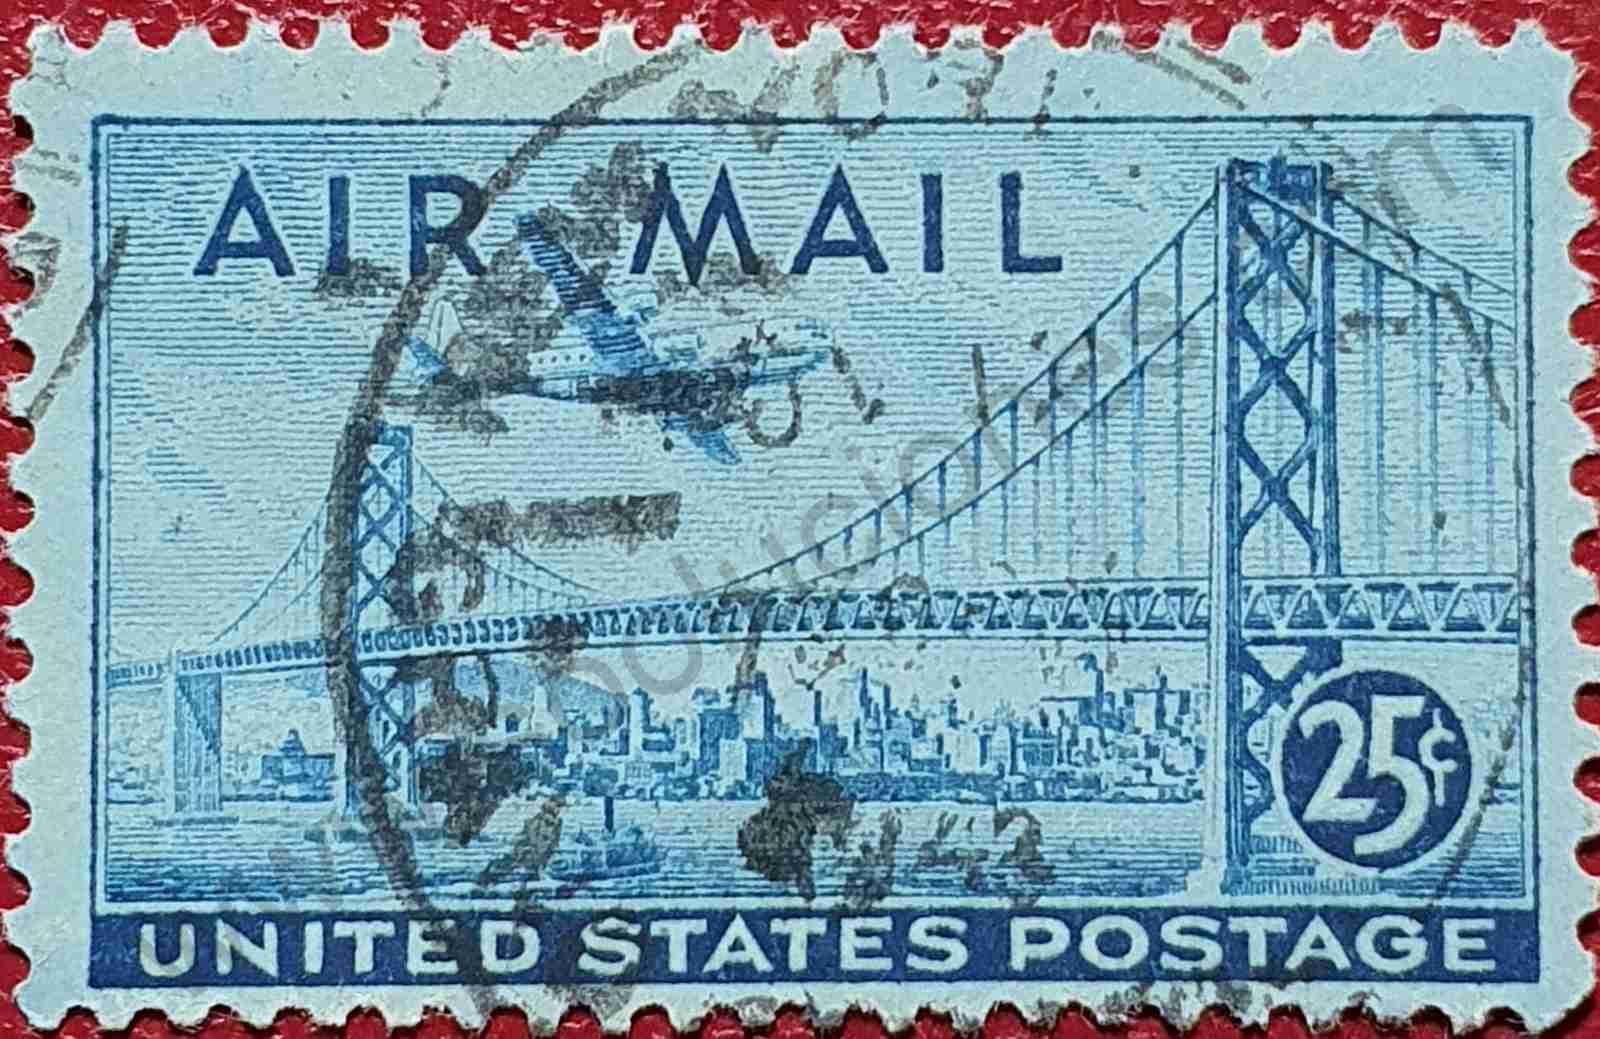 Puente Oakland - San Francisco - Sello Estados Unidos 1947